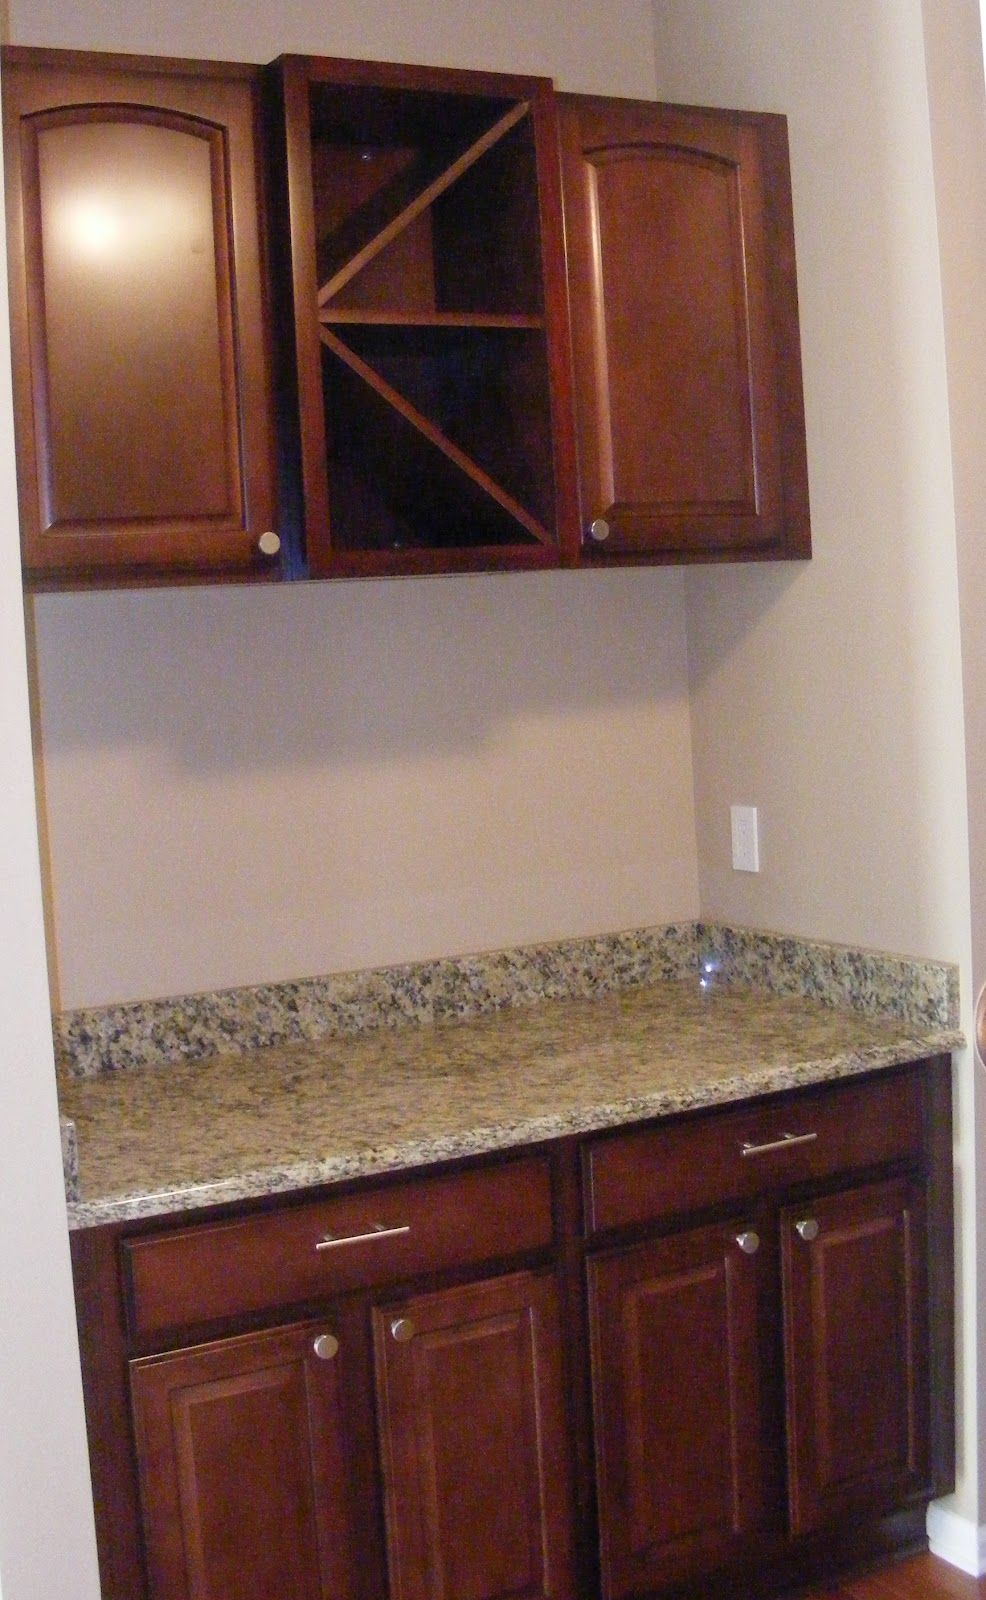 home bar basement remodeling ideas inspiration | small basement dry bar - Google Search | House Ideas ...